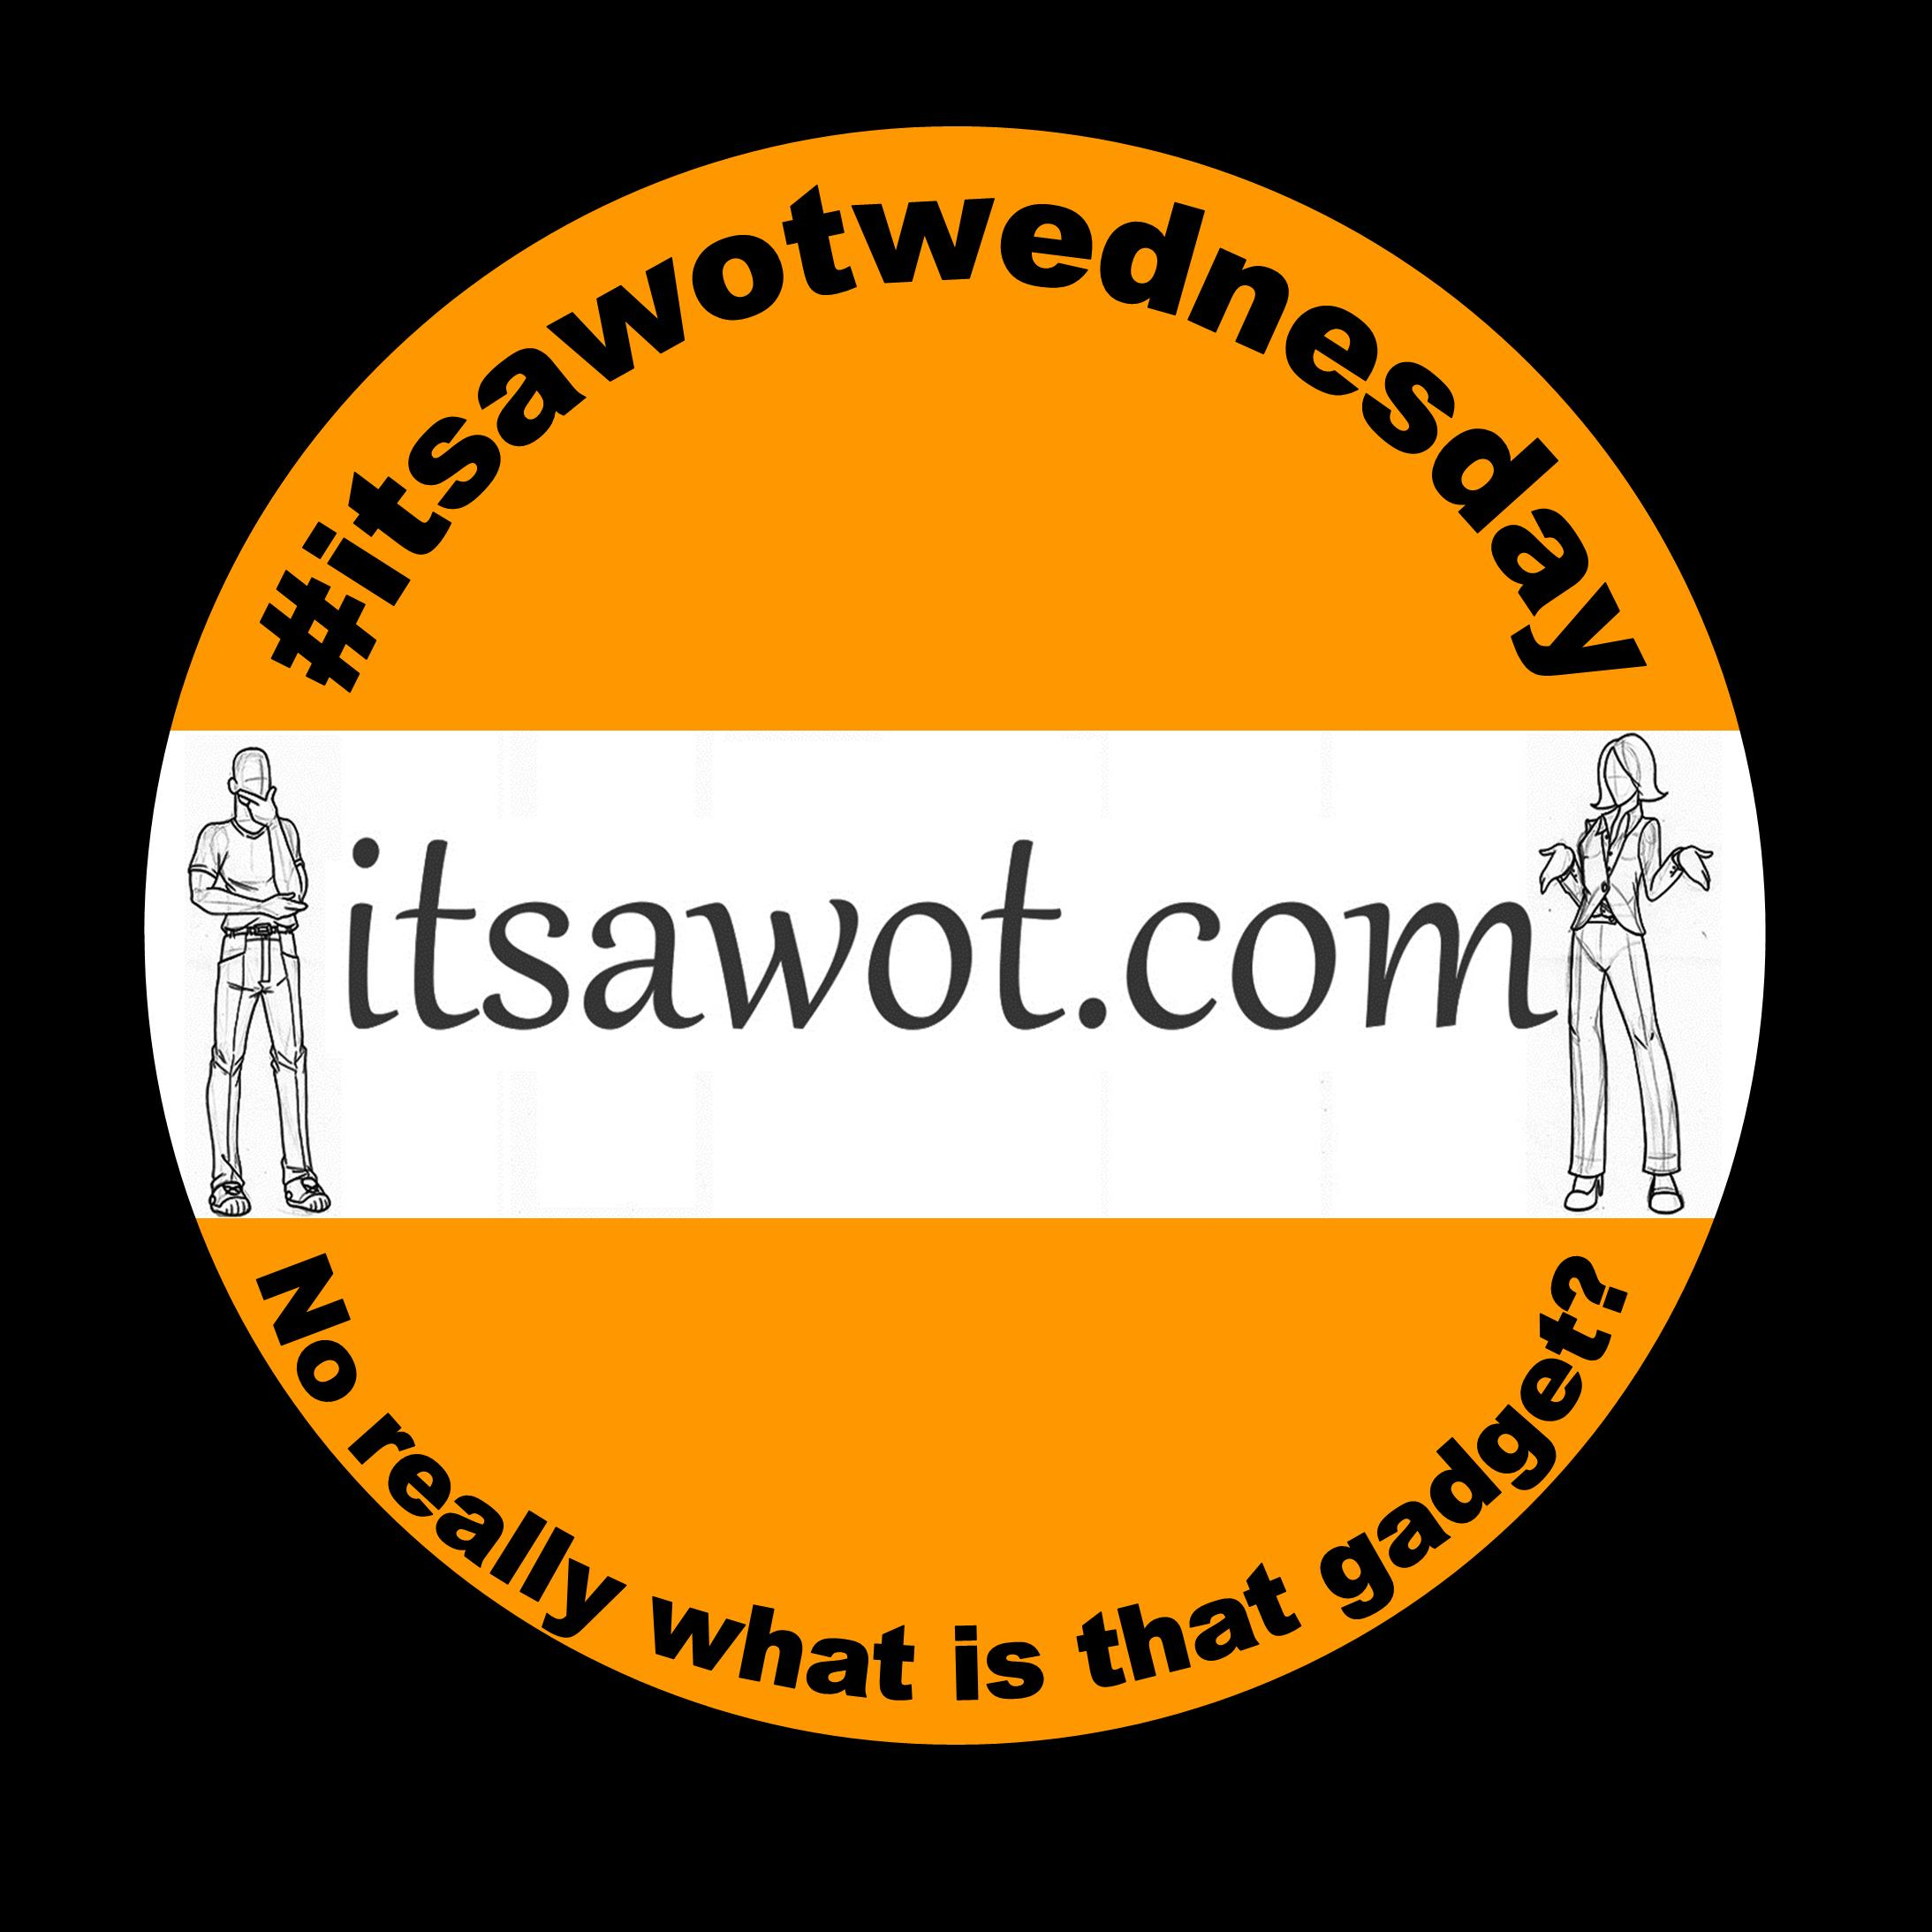 #itsawotwednesday